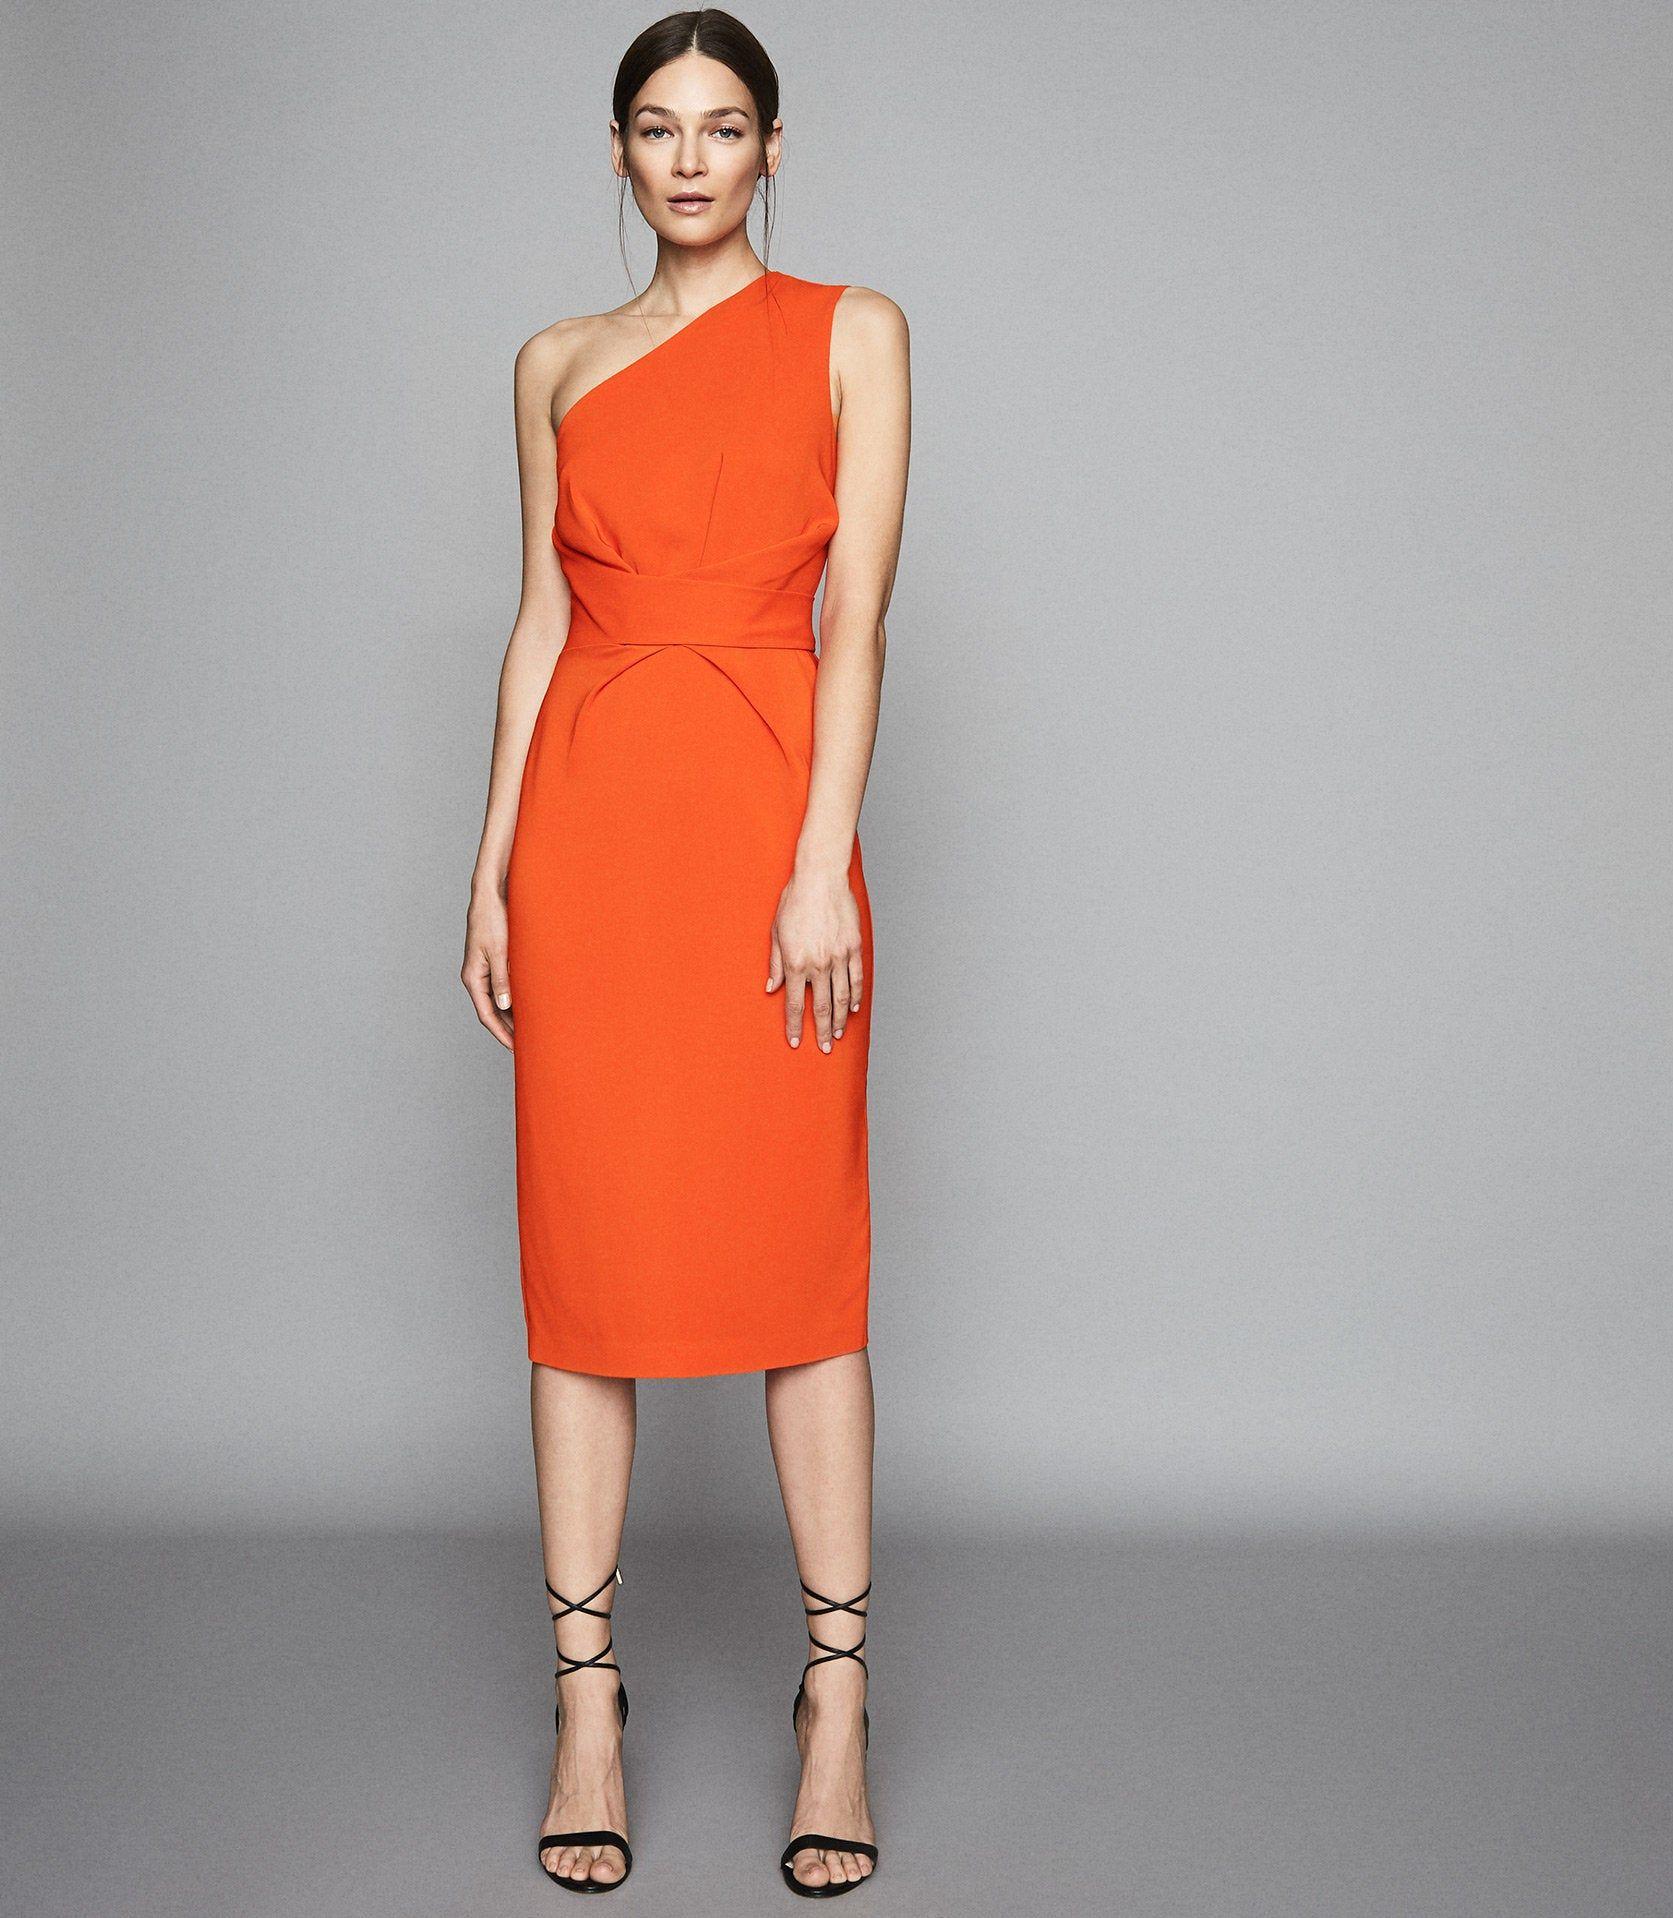 Reiss Laurent One Shoulder Slim Fit Dress In Orange Womens Size 6 Beautiful Dresses For Women Orange Cocktail Dresses Clothes For Women [ 1918 x 1673 Pixel ]